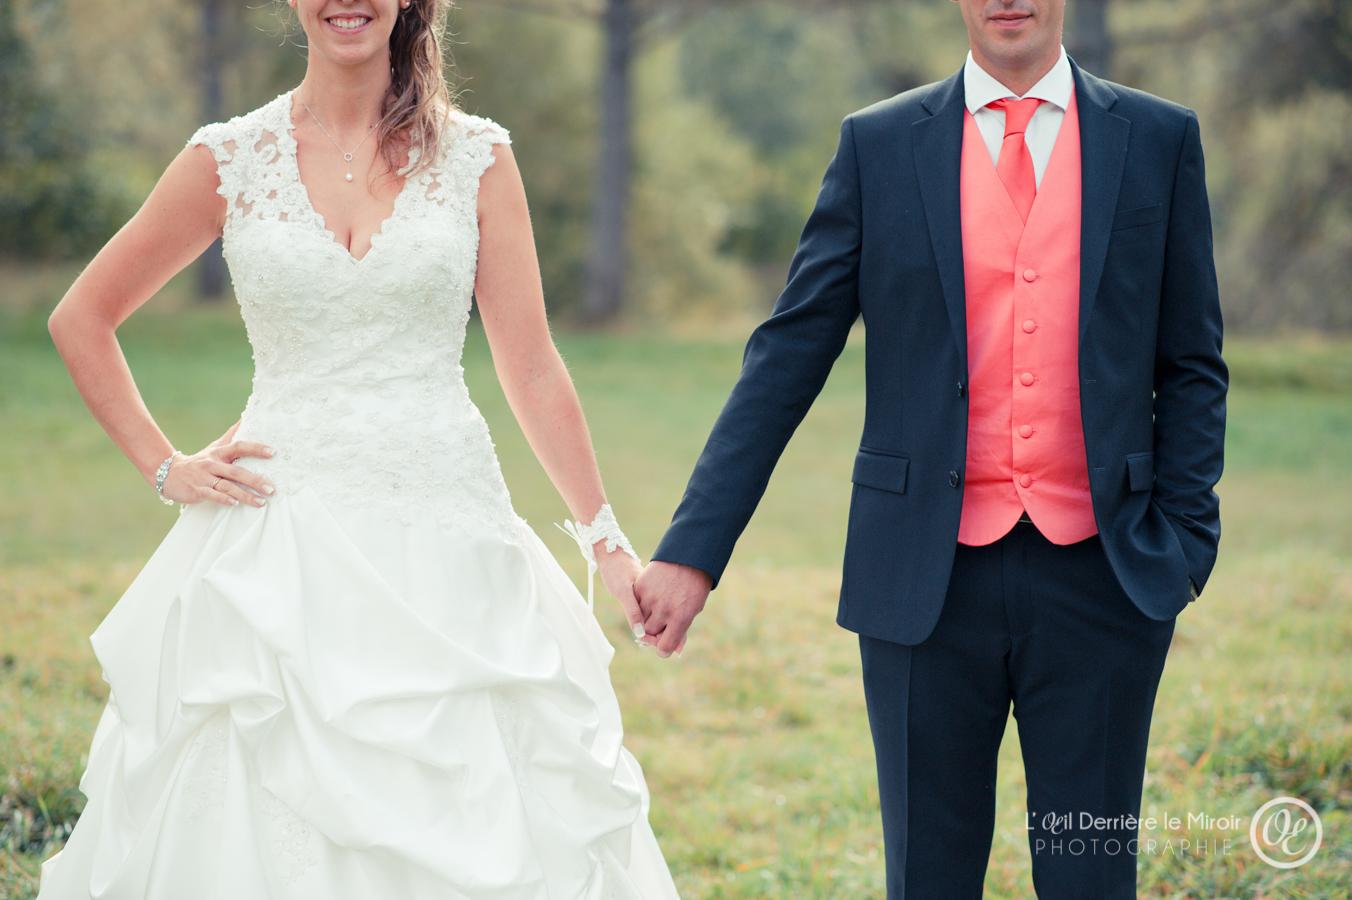 After-wedding-Audrey-Luis-loeilderrierelemiroir-27